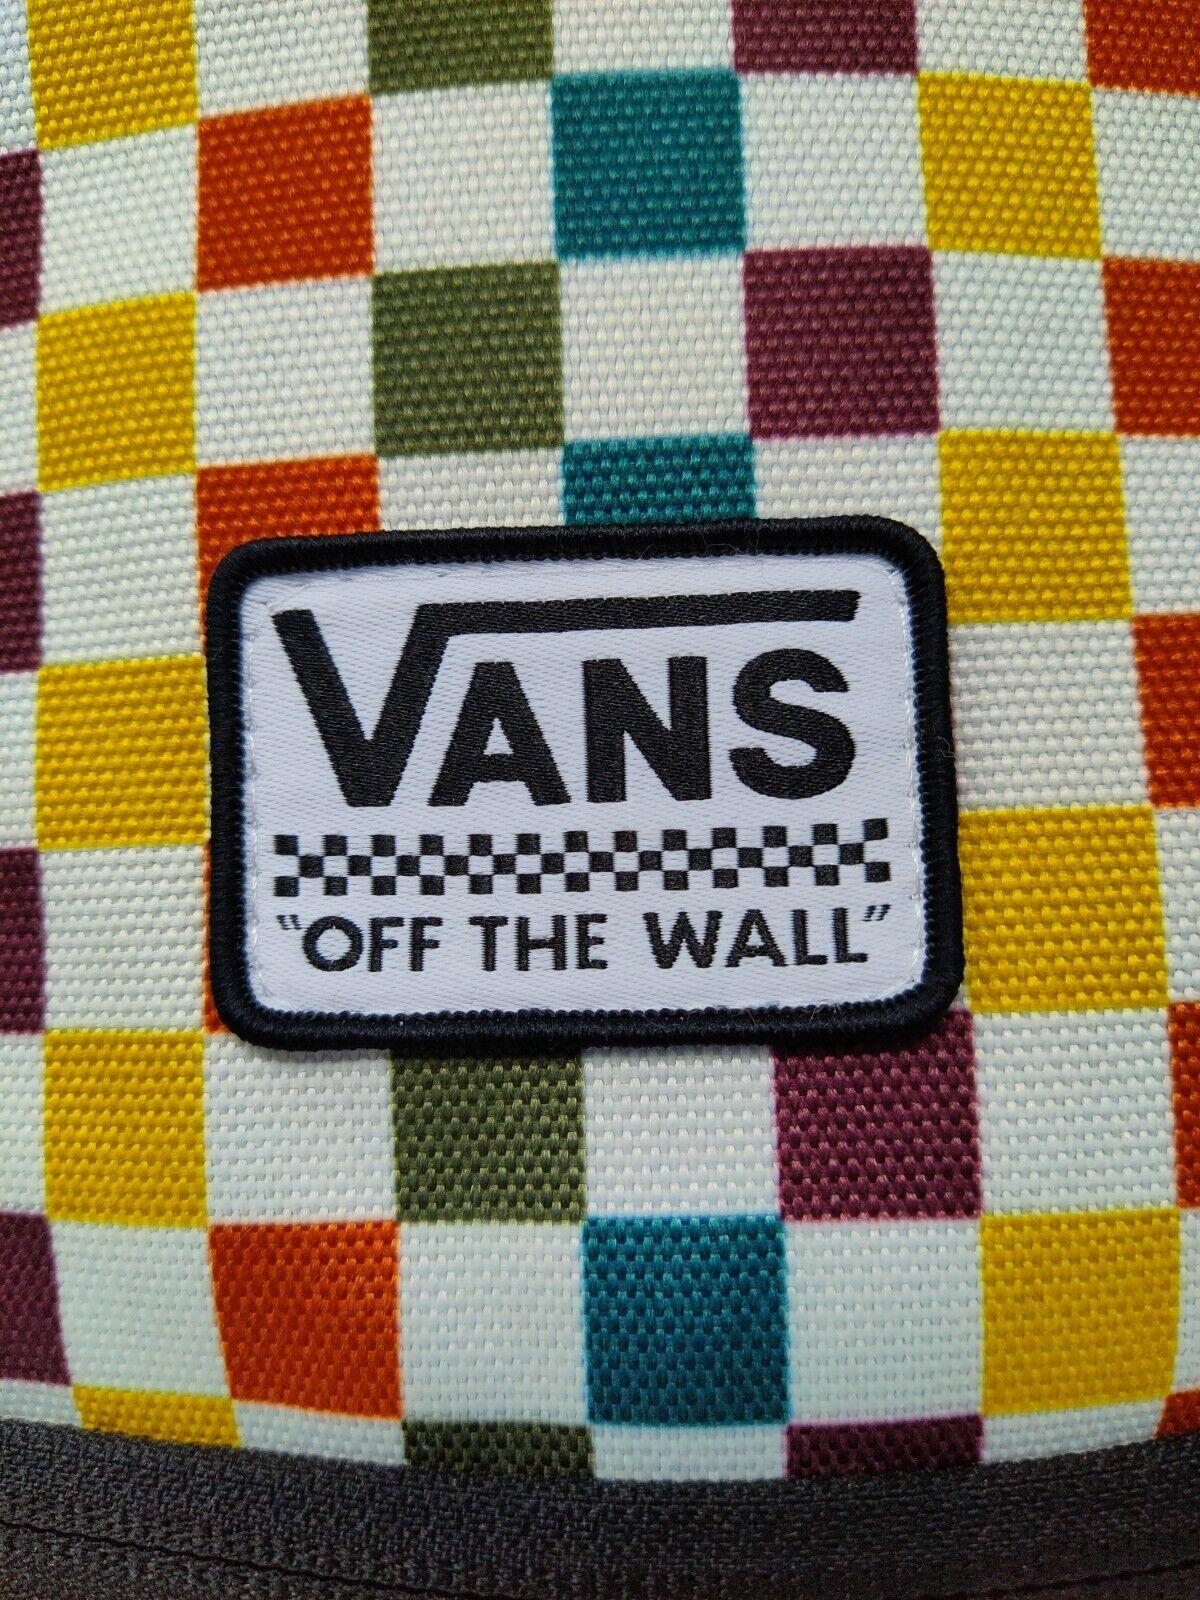 Vans Motivee 3-B Multicolor Checkerboard Unisex Backpack (Off The Wall )Vintage